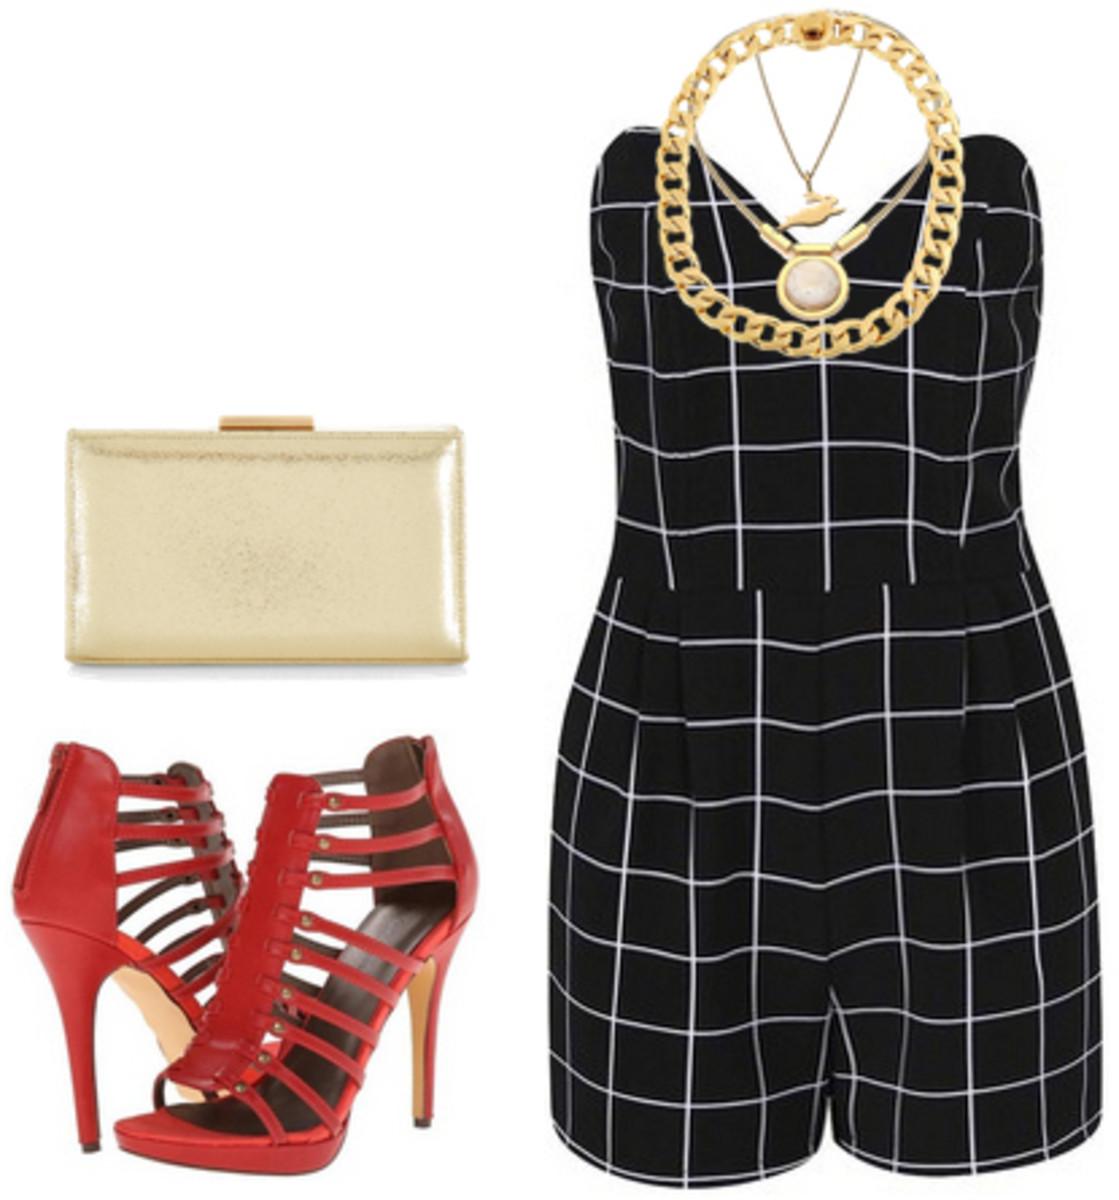 black-jumper-romper-red-shoe-sandalh-chain-necklace-tan-bag-clutch-windowpane-print-spring-summer-dinner.jpg